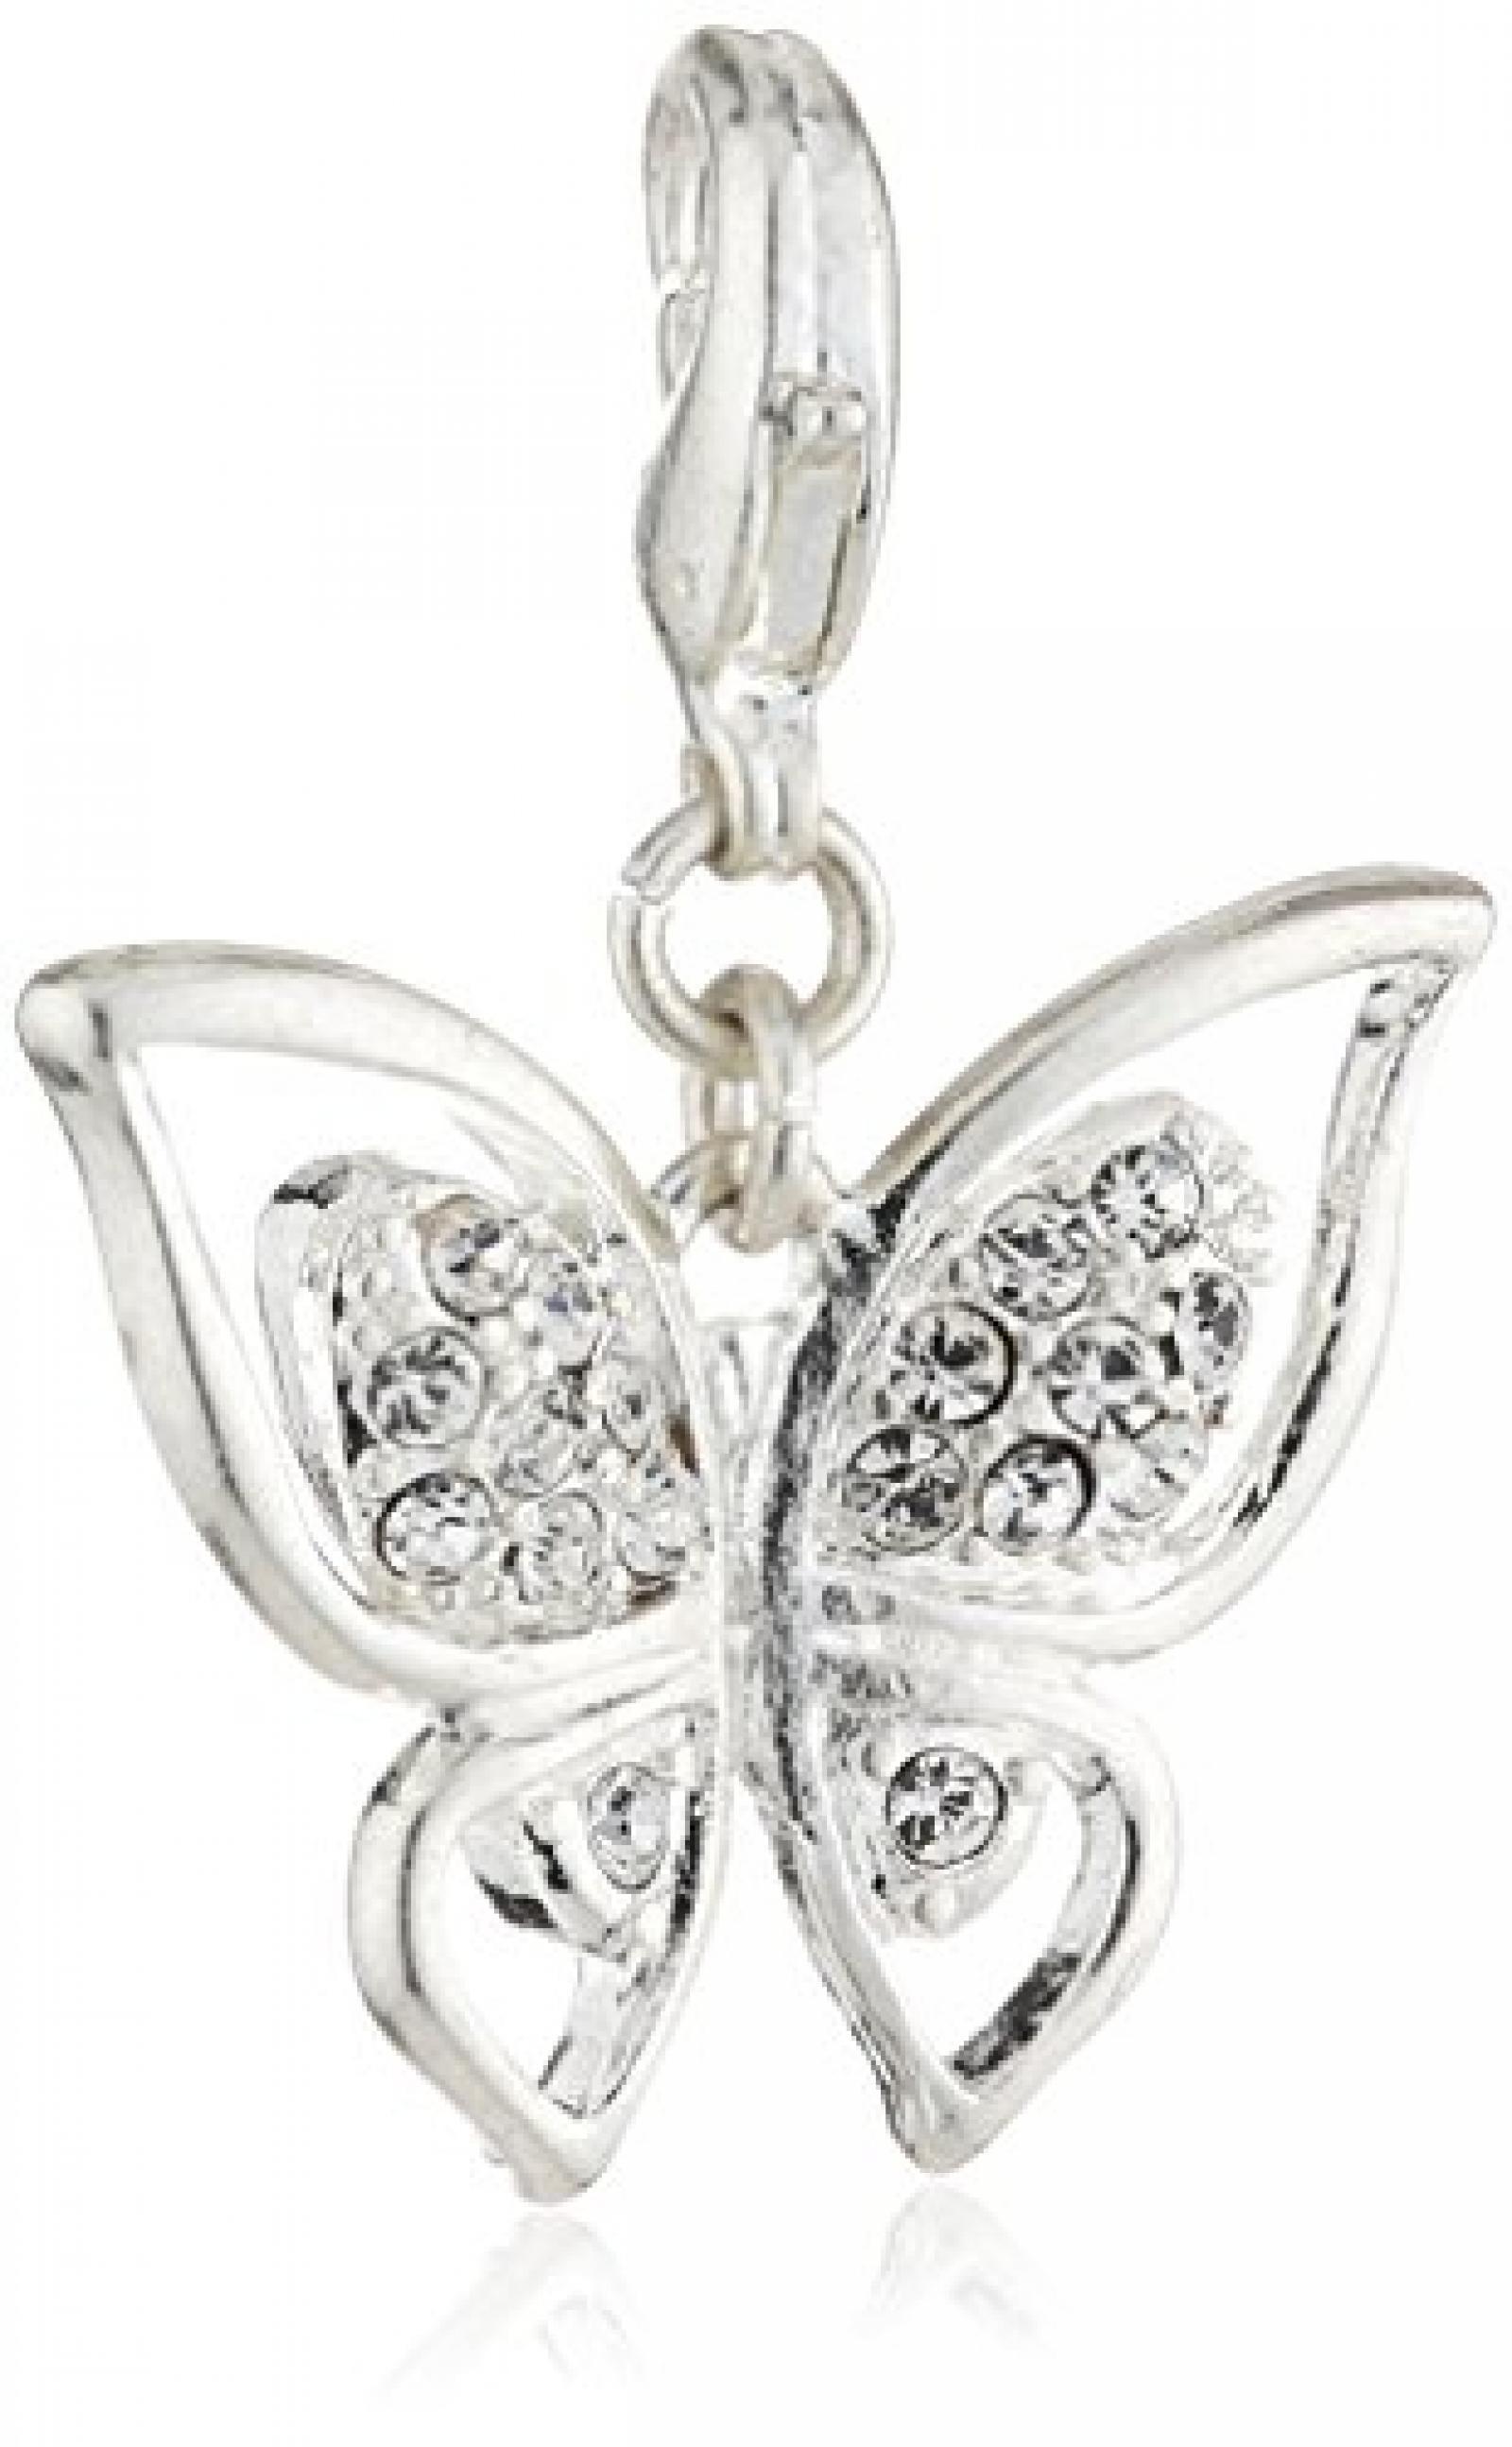 Pilgrim Jewelry Damen-Anhänger Messing aus der Serie versilbert,weiß 3 cm 401326001